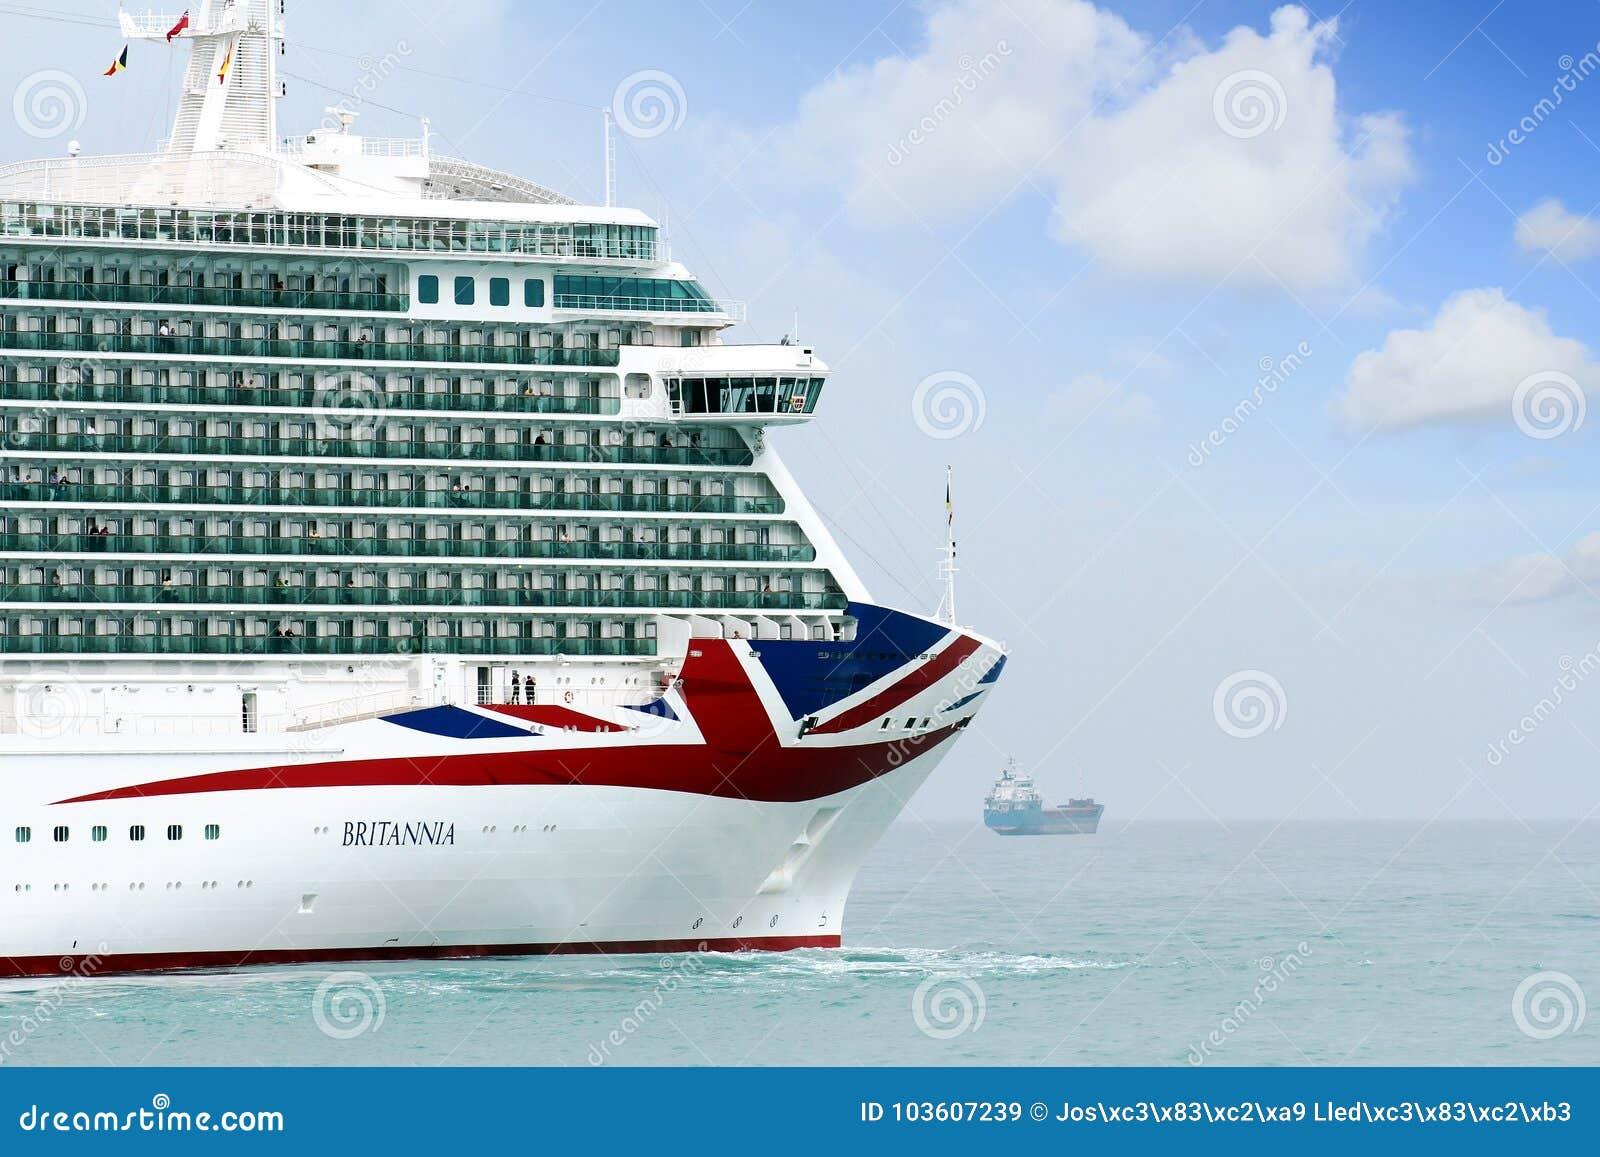 Big Cruise Britannia Of P&O Company Editorial Stock Image